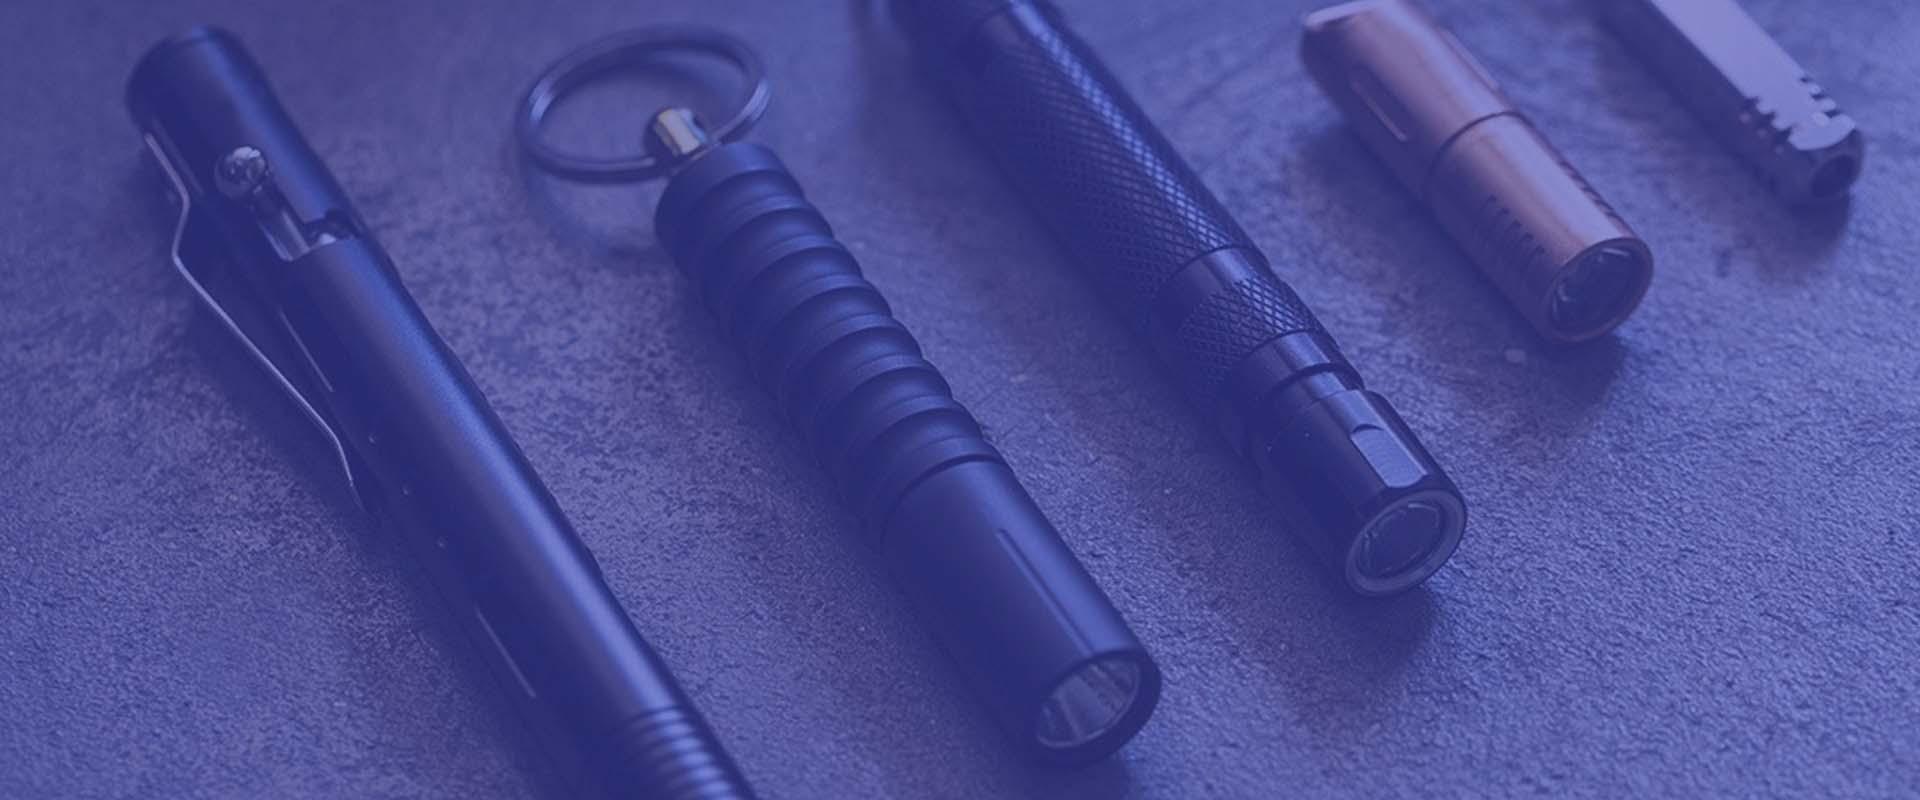 pen flashlight